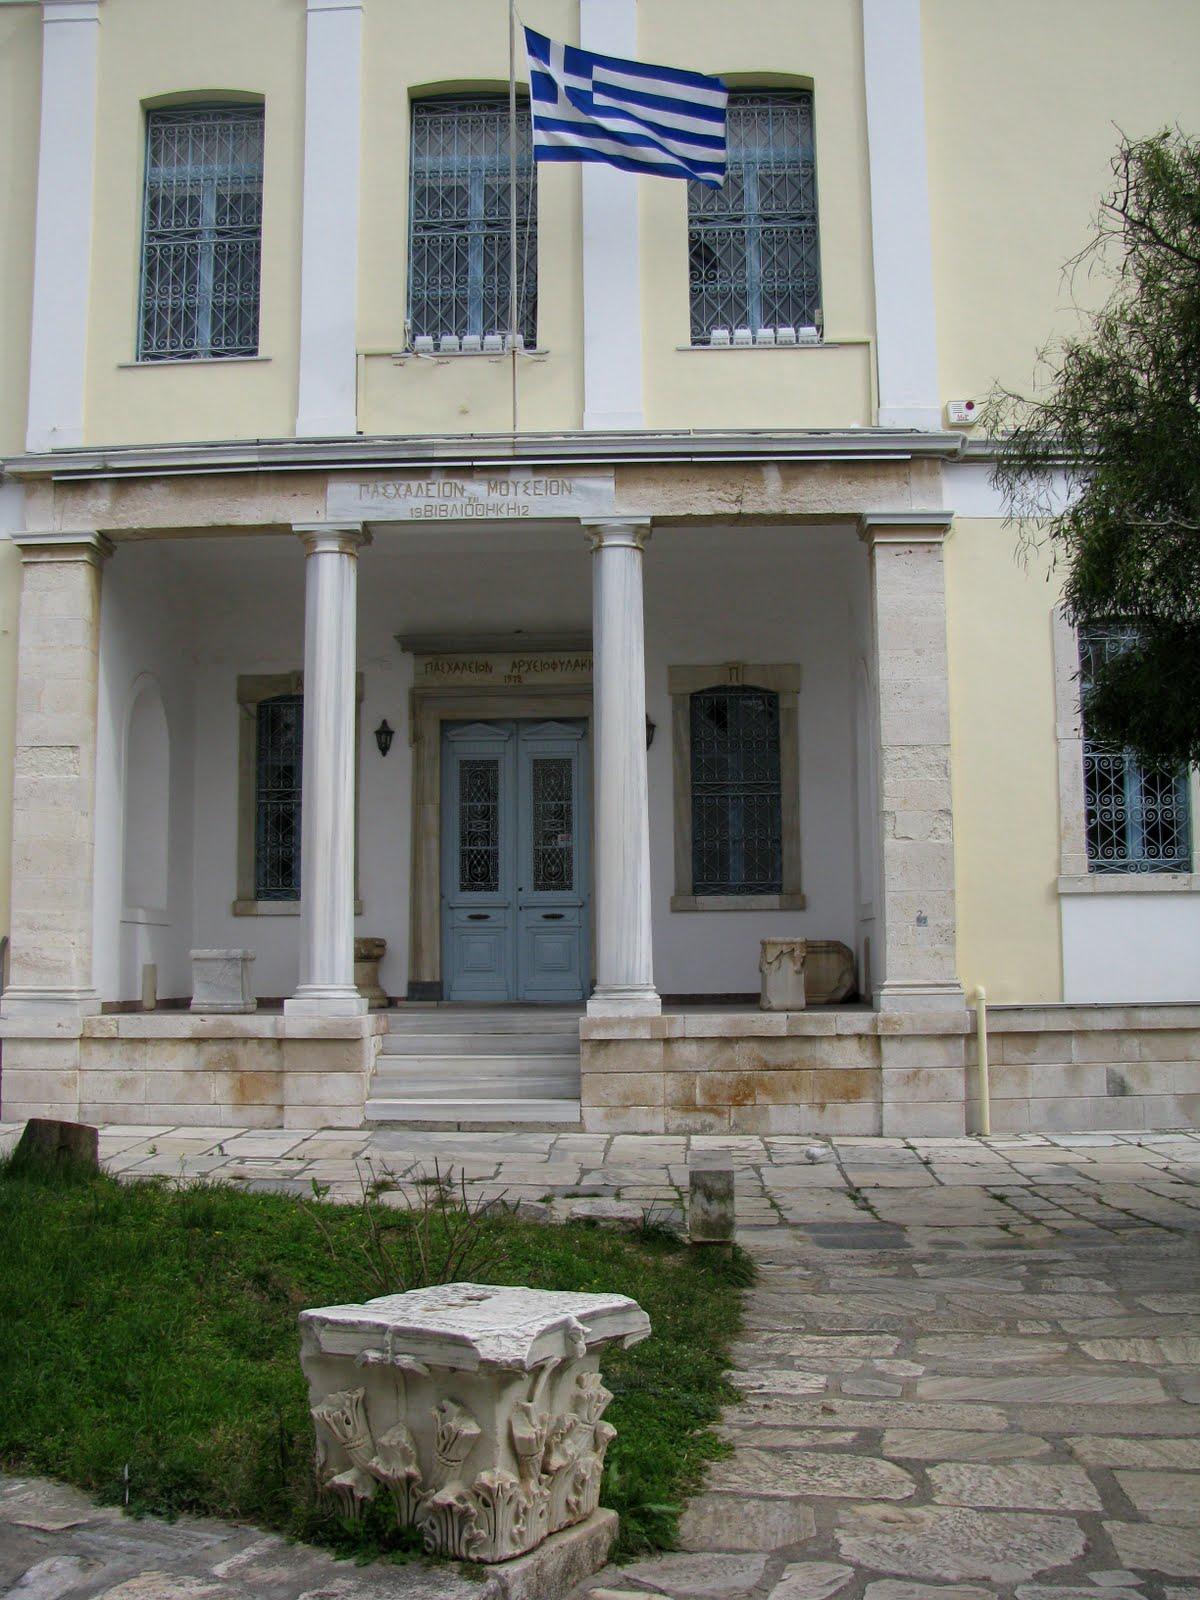 My Samos: Ένα blog για τη Σάμο: Museums on Samos Island